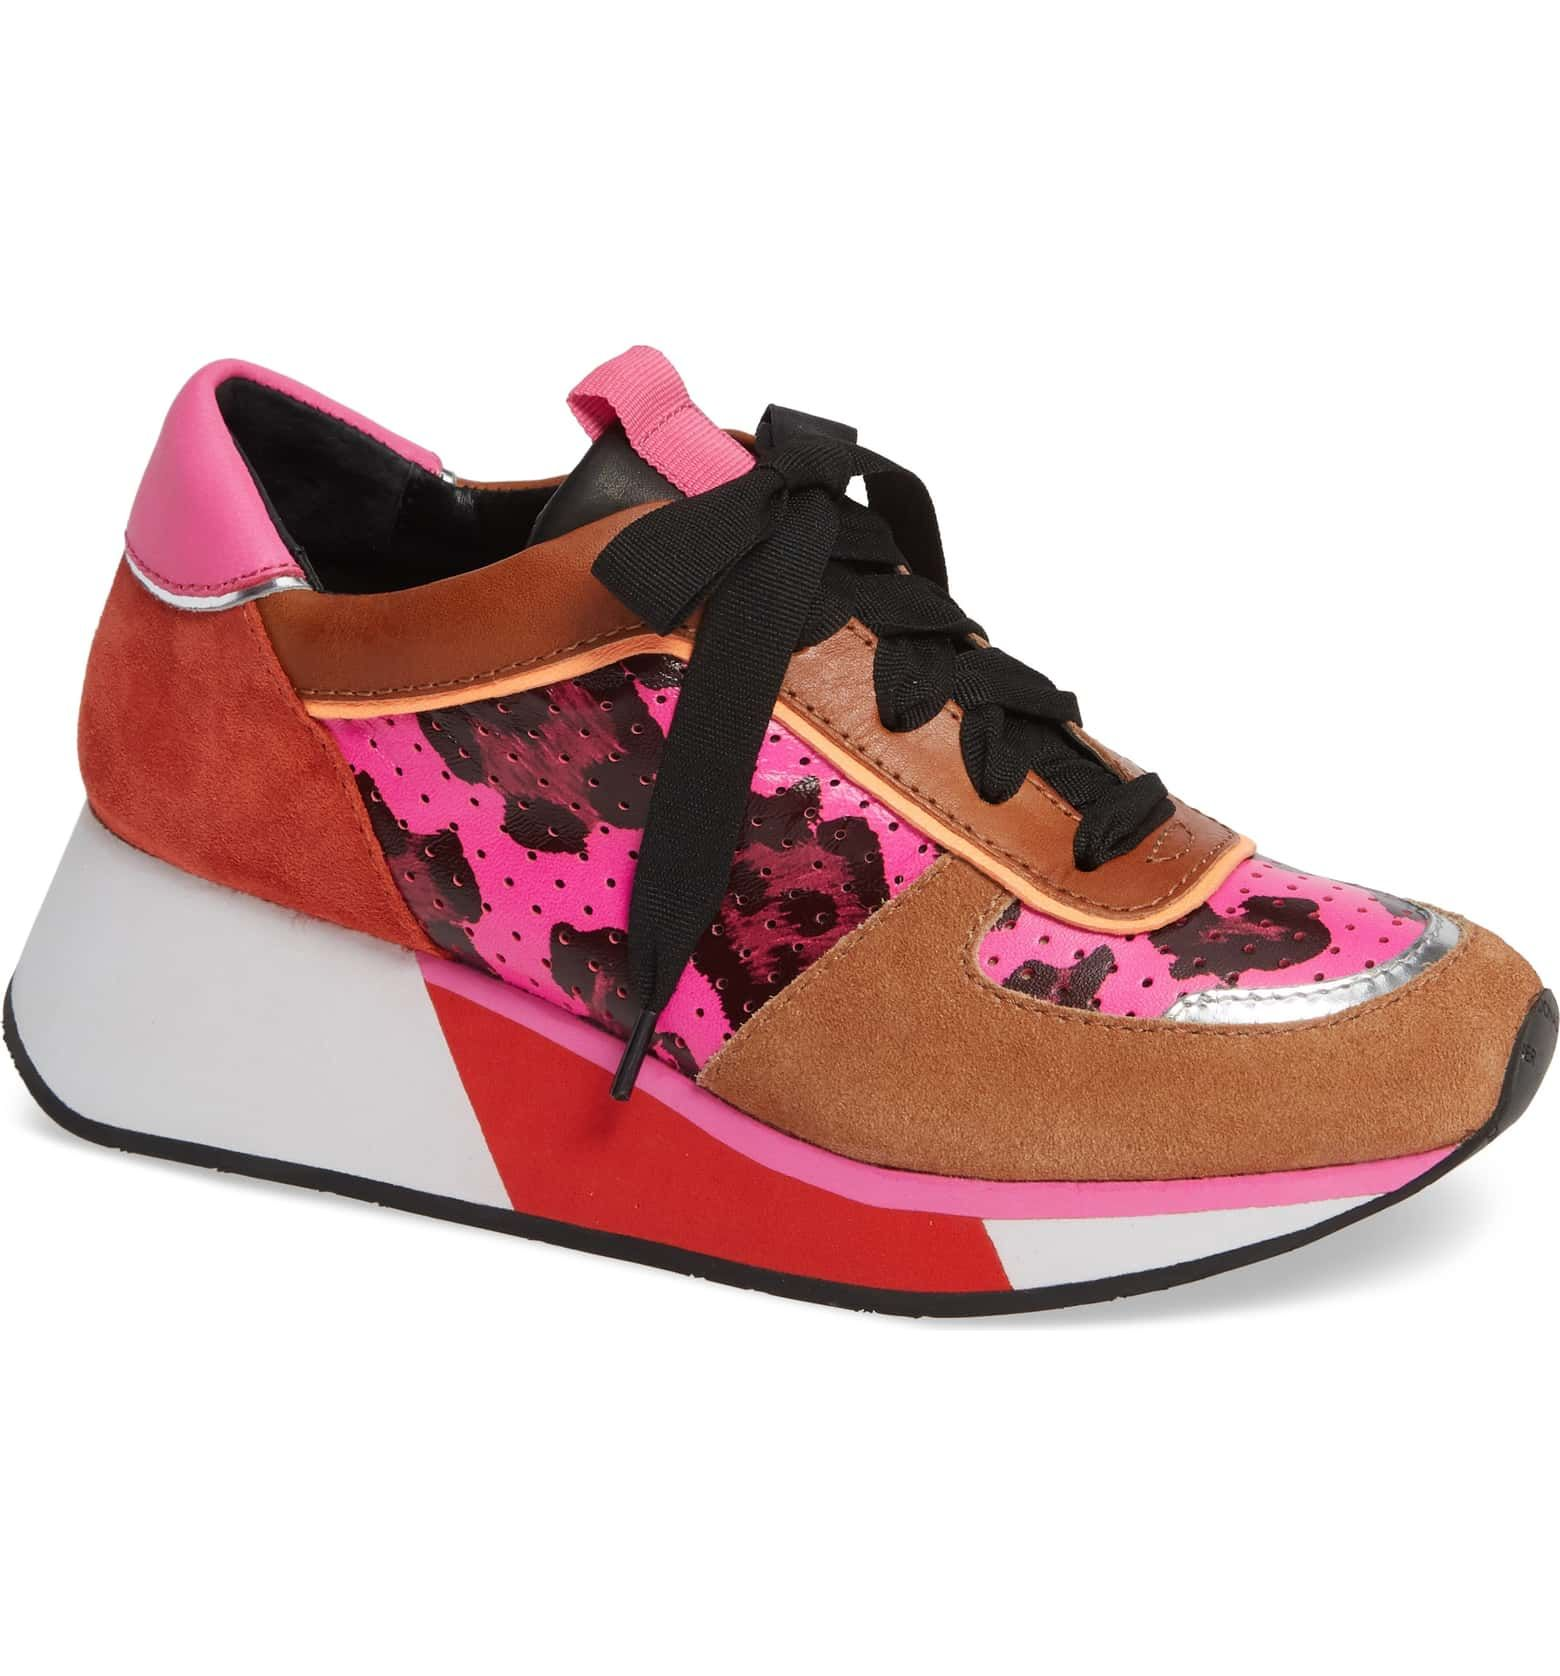 Donald Pliner Prea Colorblock Sneaker